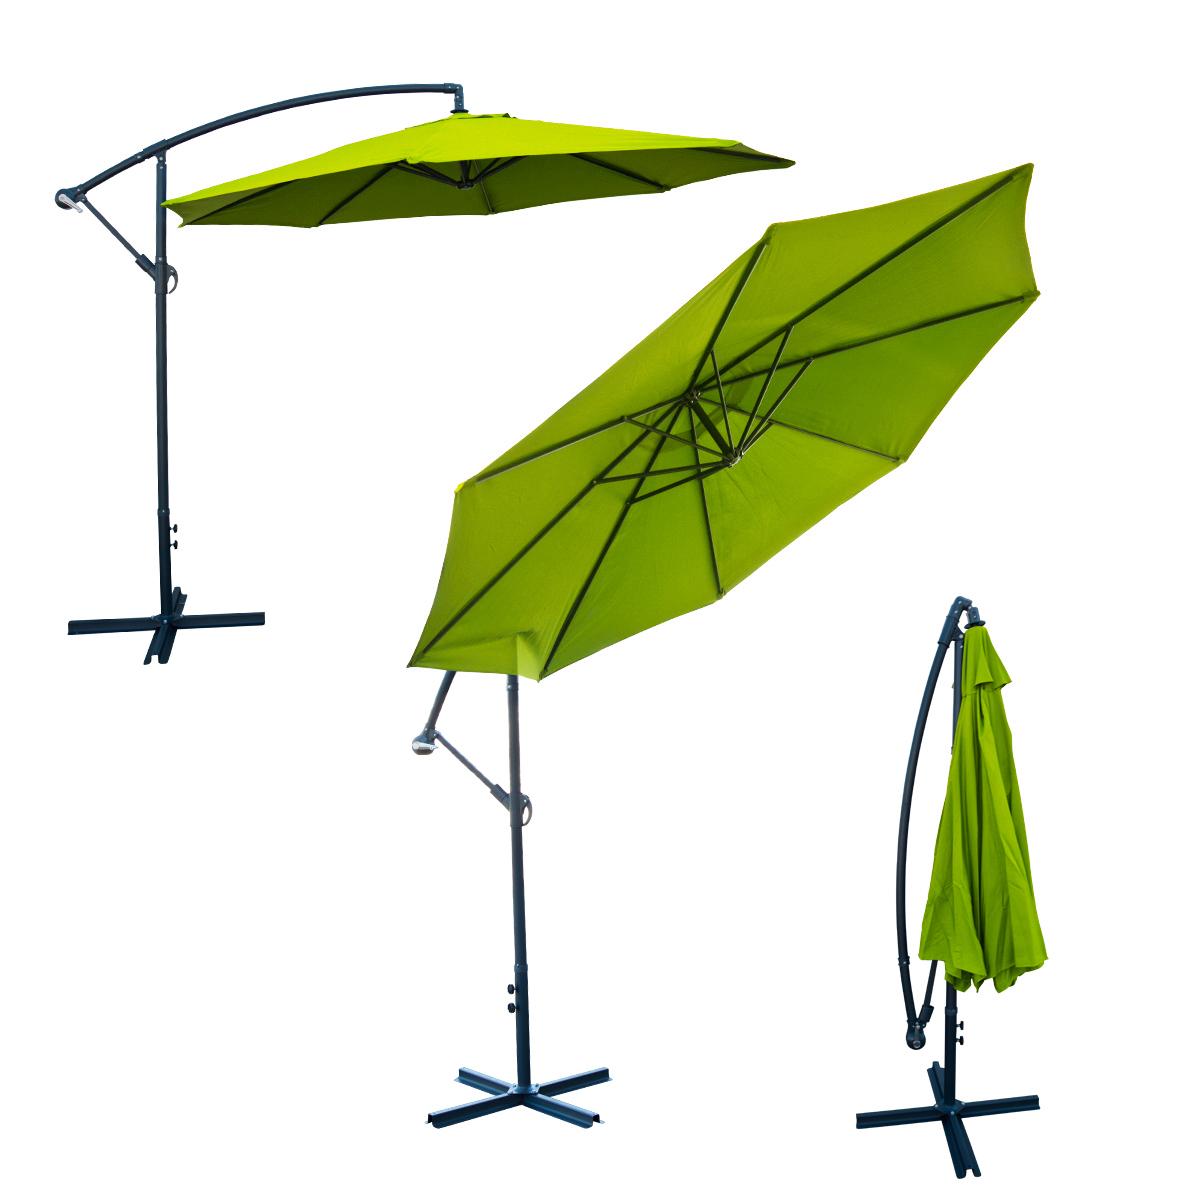 Deluxe 10 Feet Offset Umbrella Patio Off Set Tilt Crank